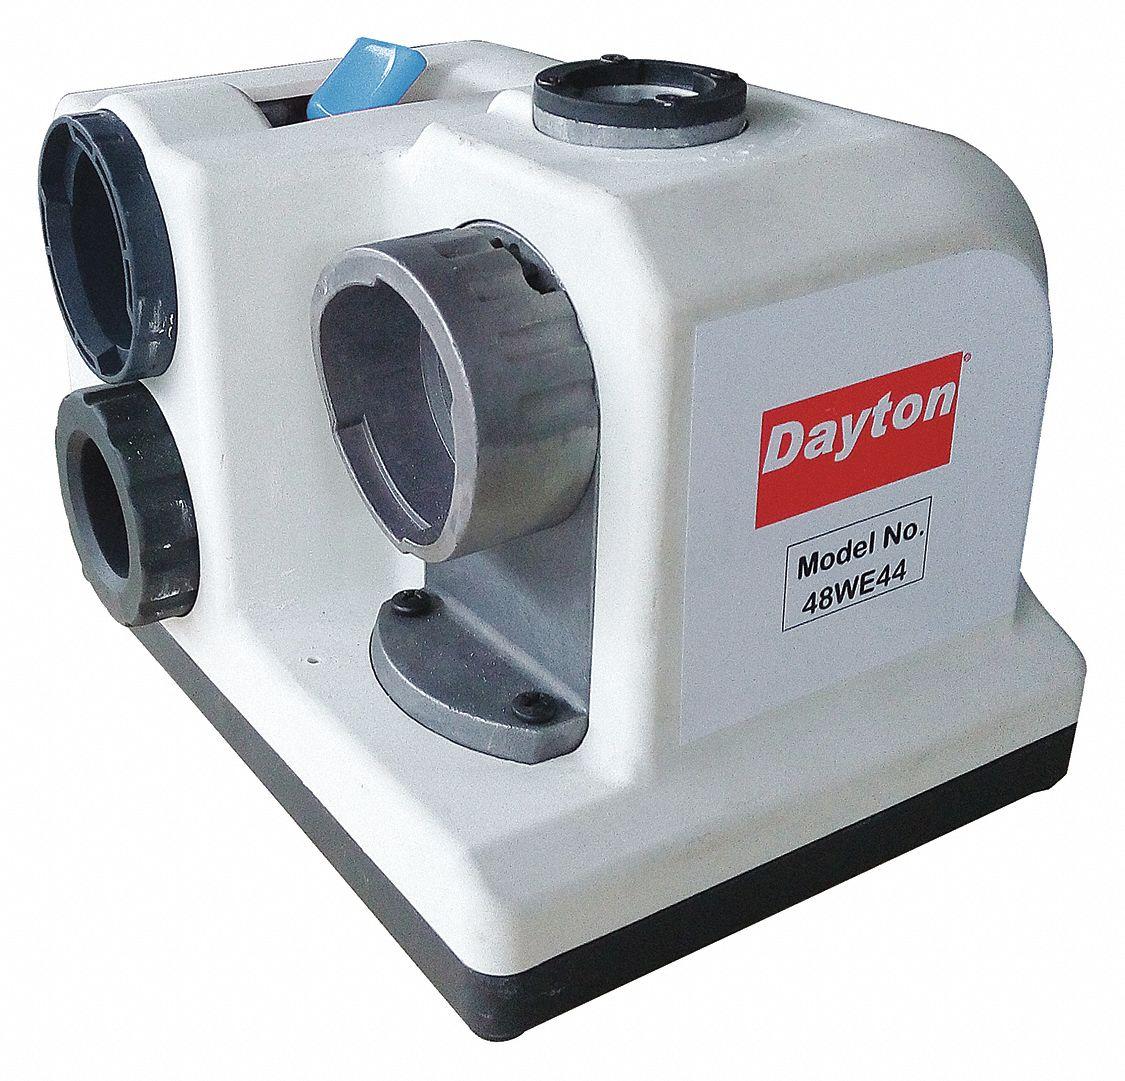 hight resolution of  dayton grinder parts list dayton drill bit grinder 3 dia 115v